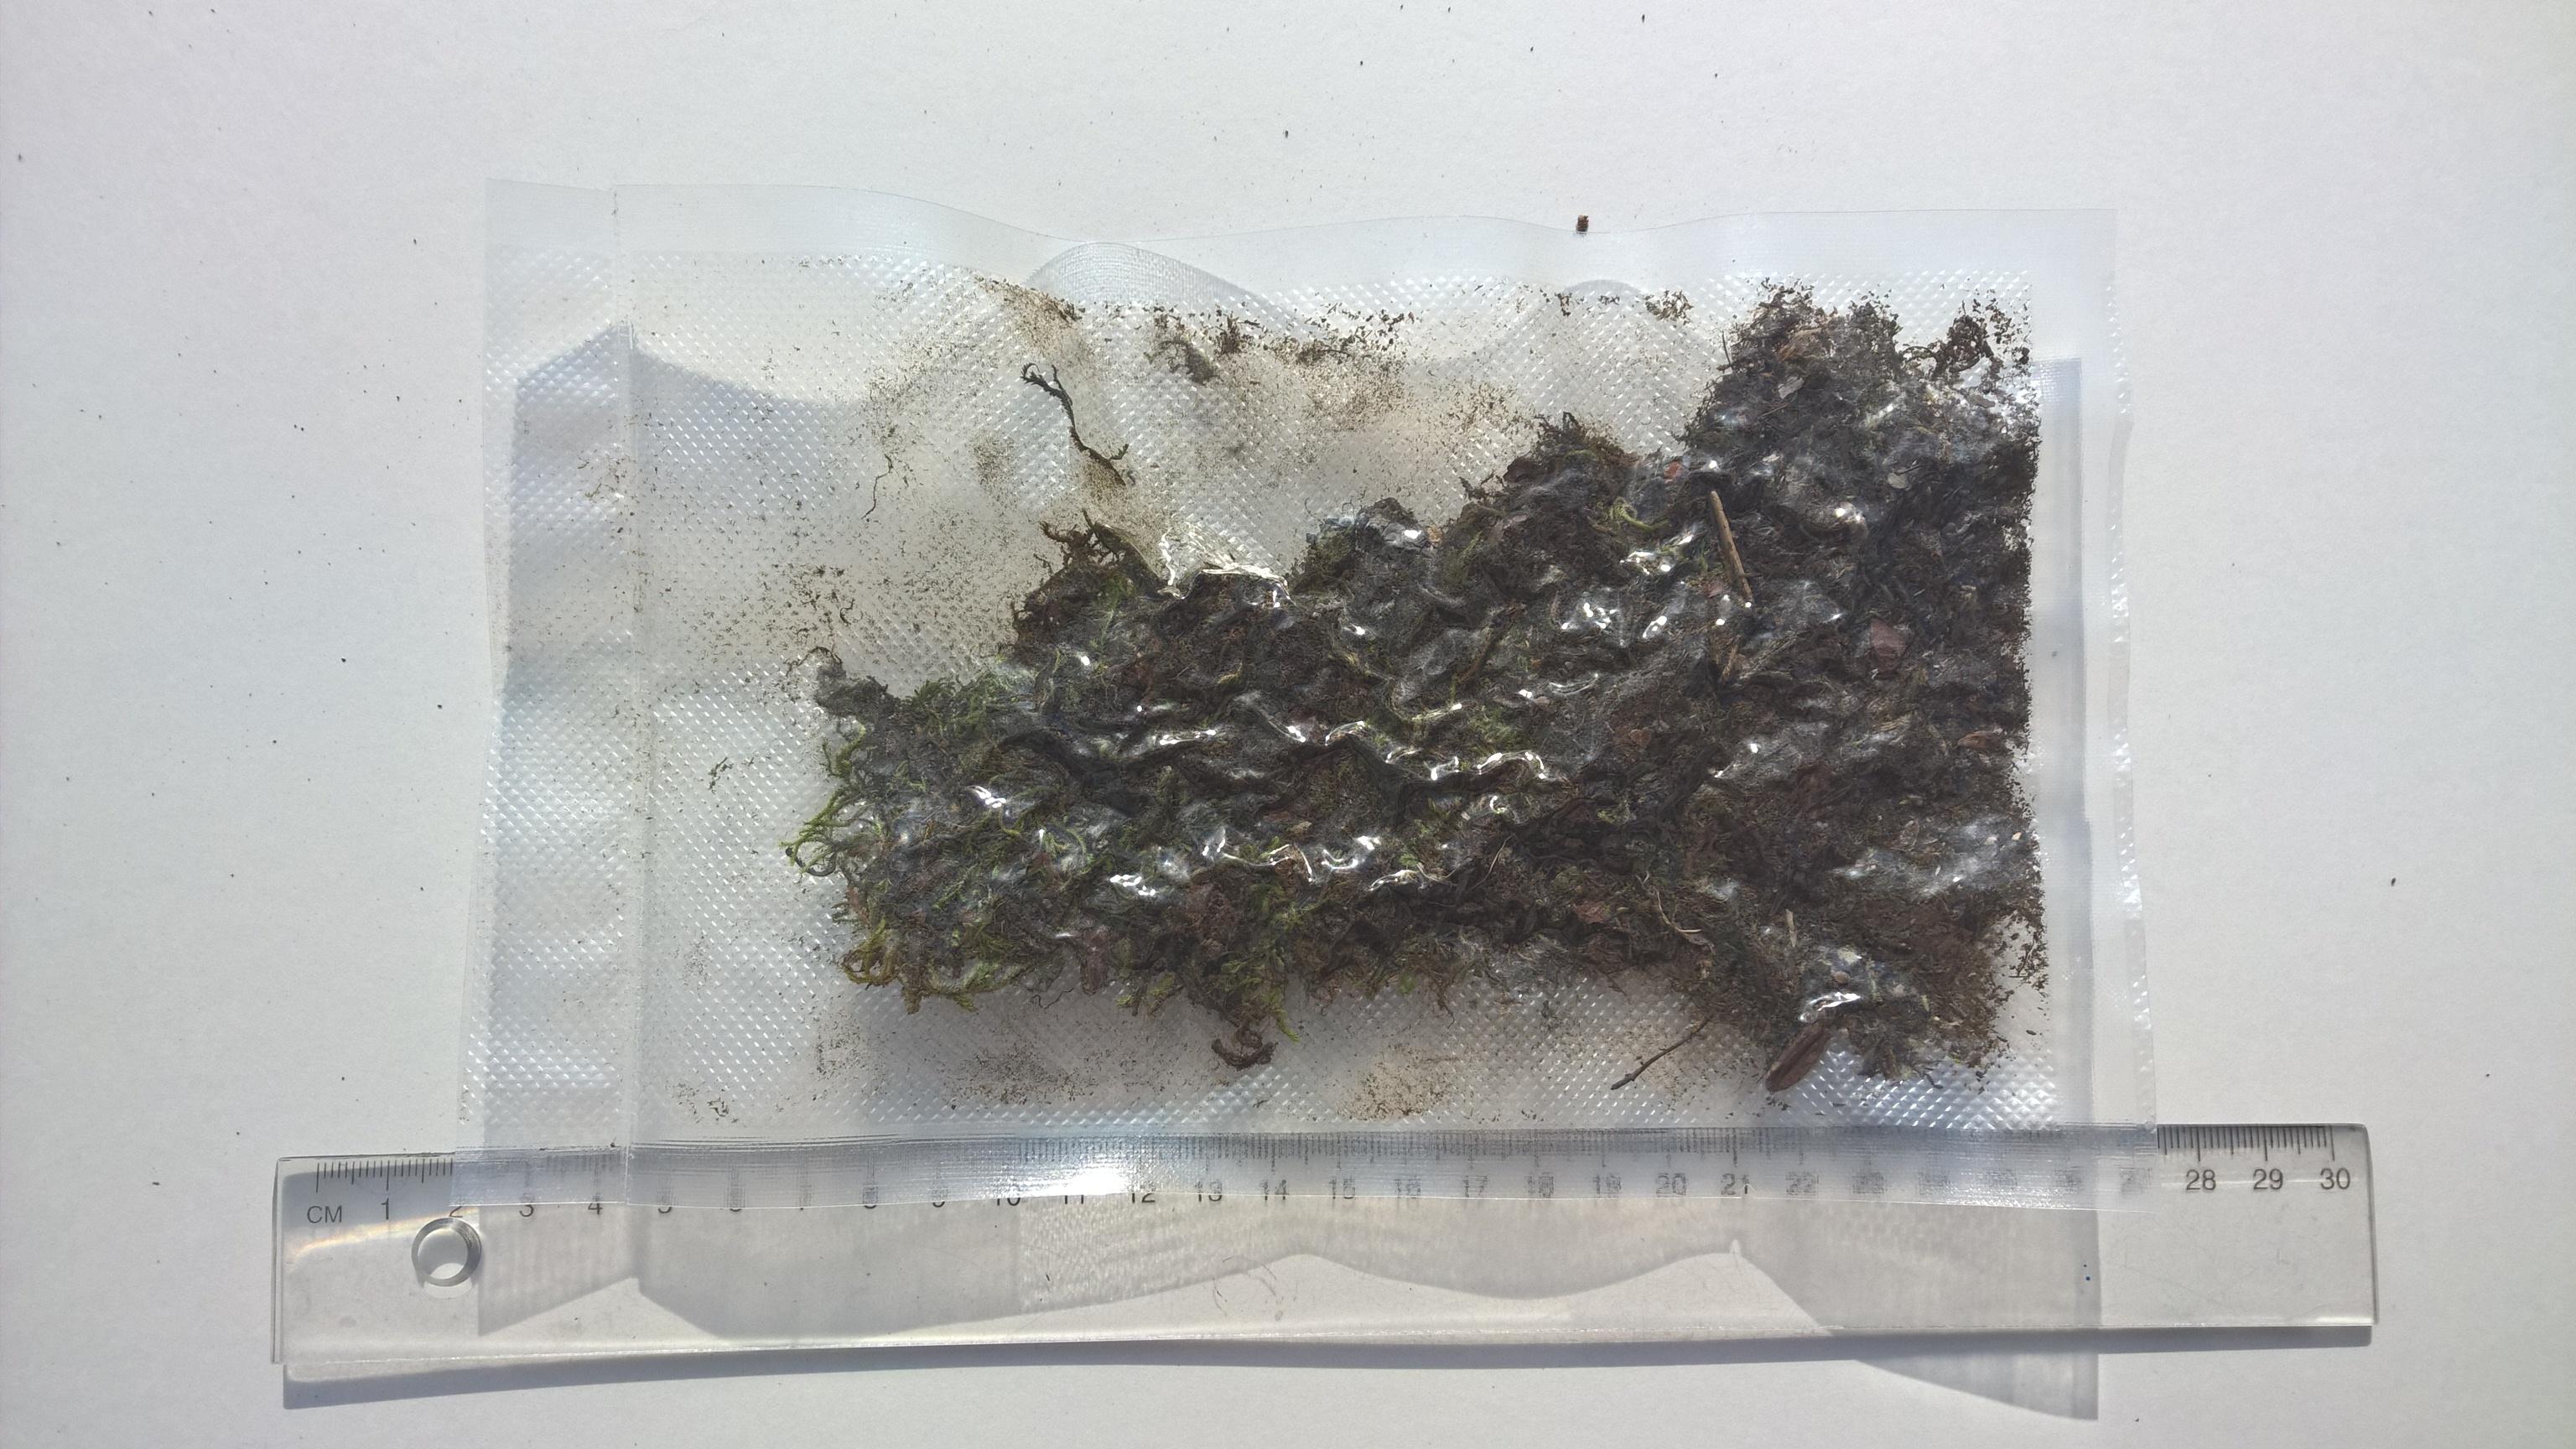 Atemberaubend Moossporen Mix 10 Gramm - Redfrogteam @FD_79